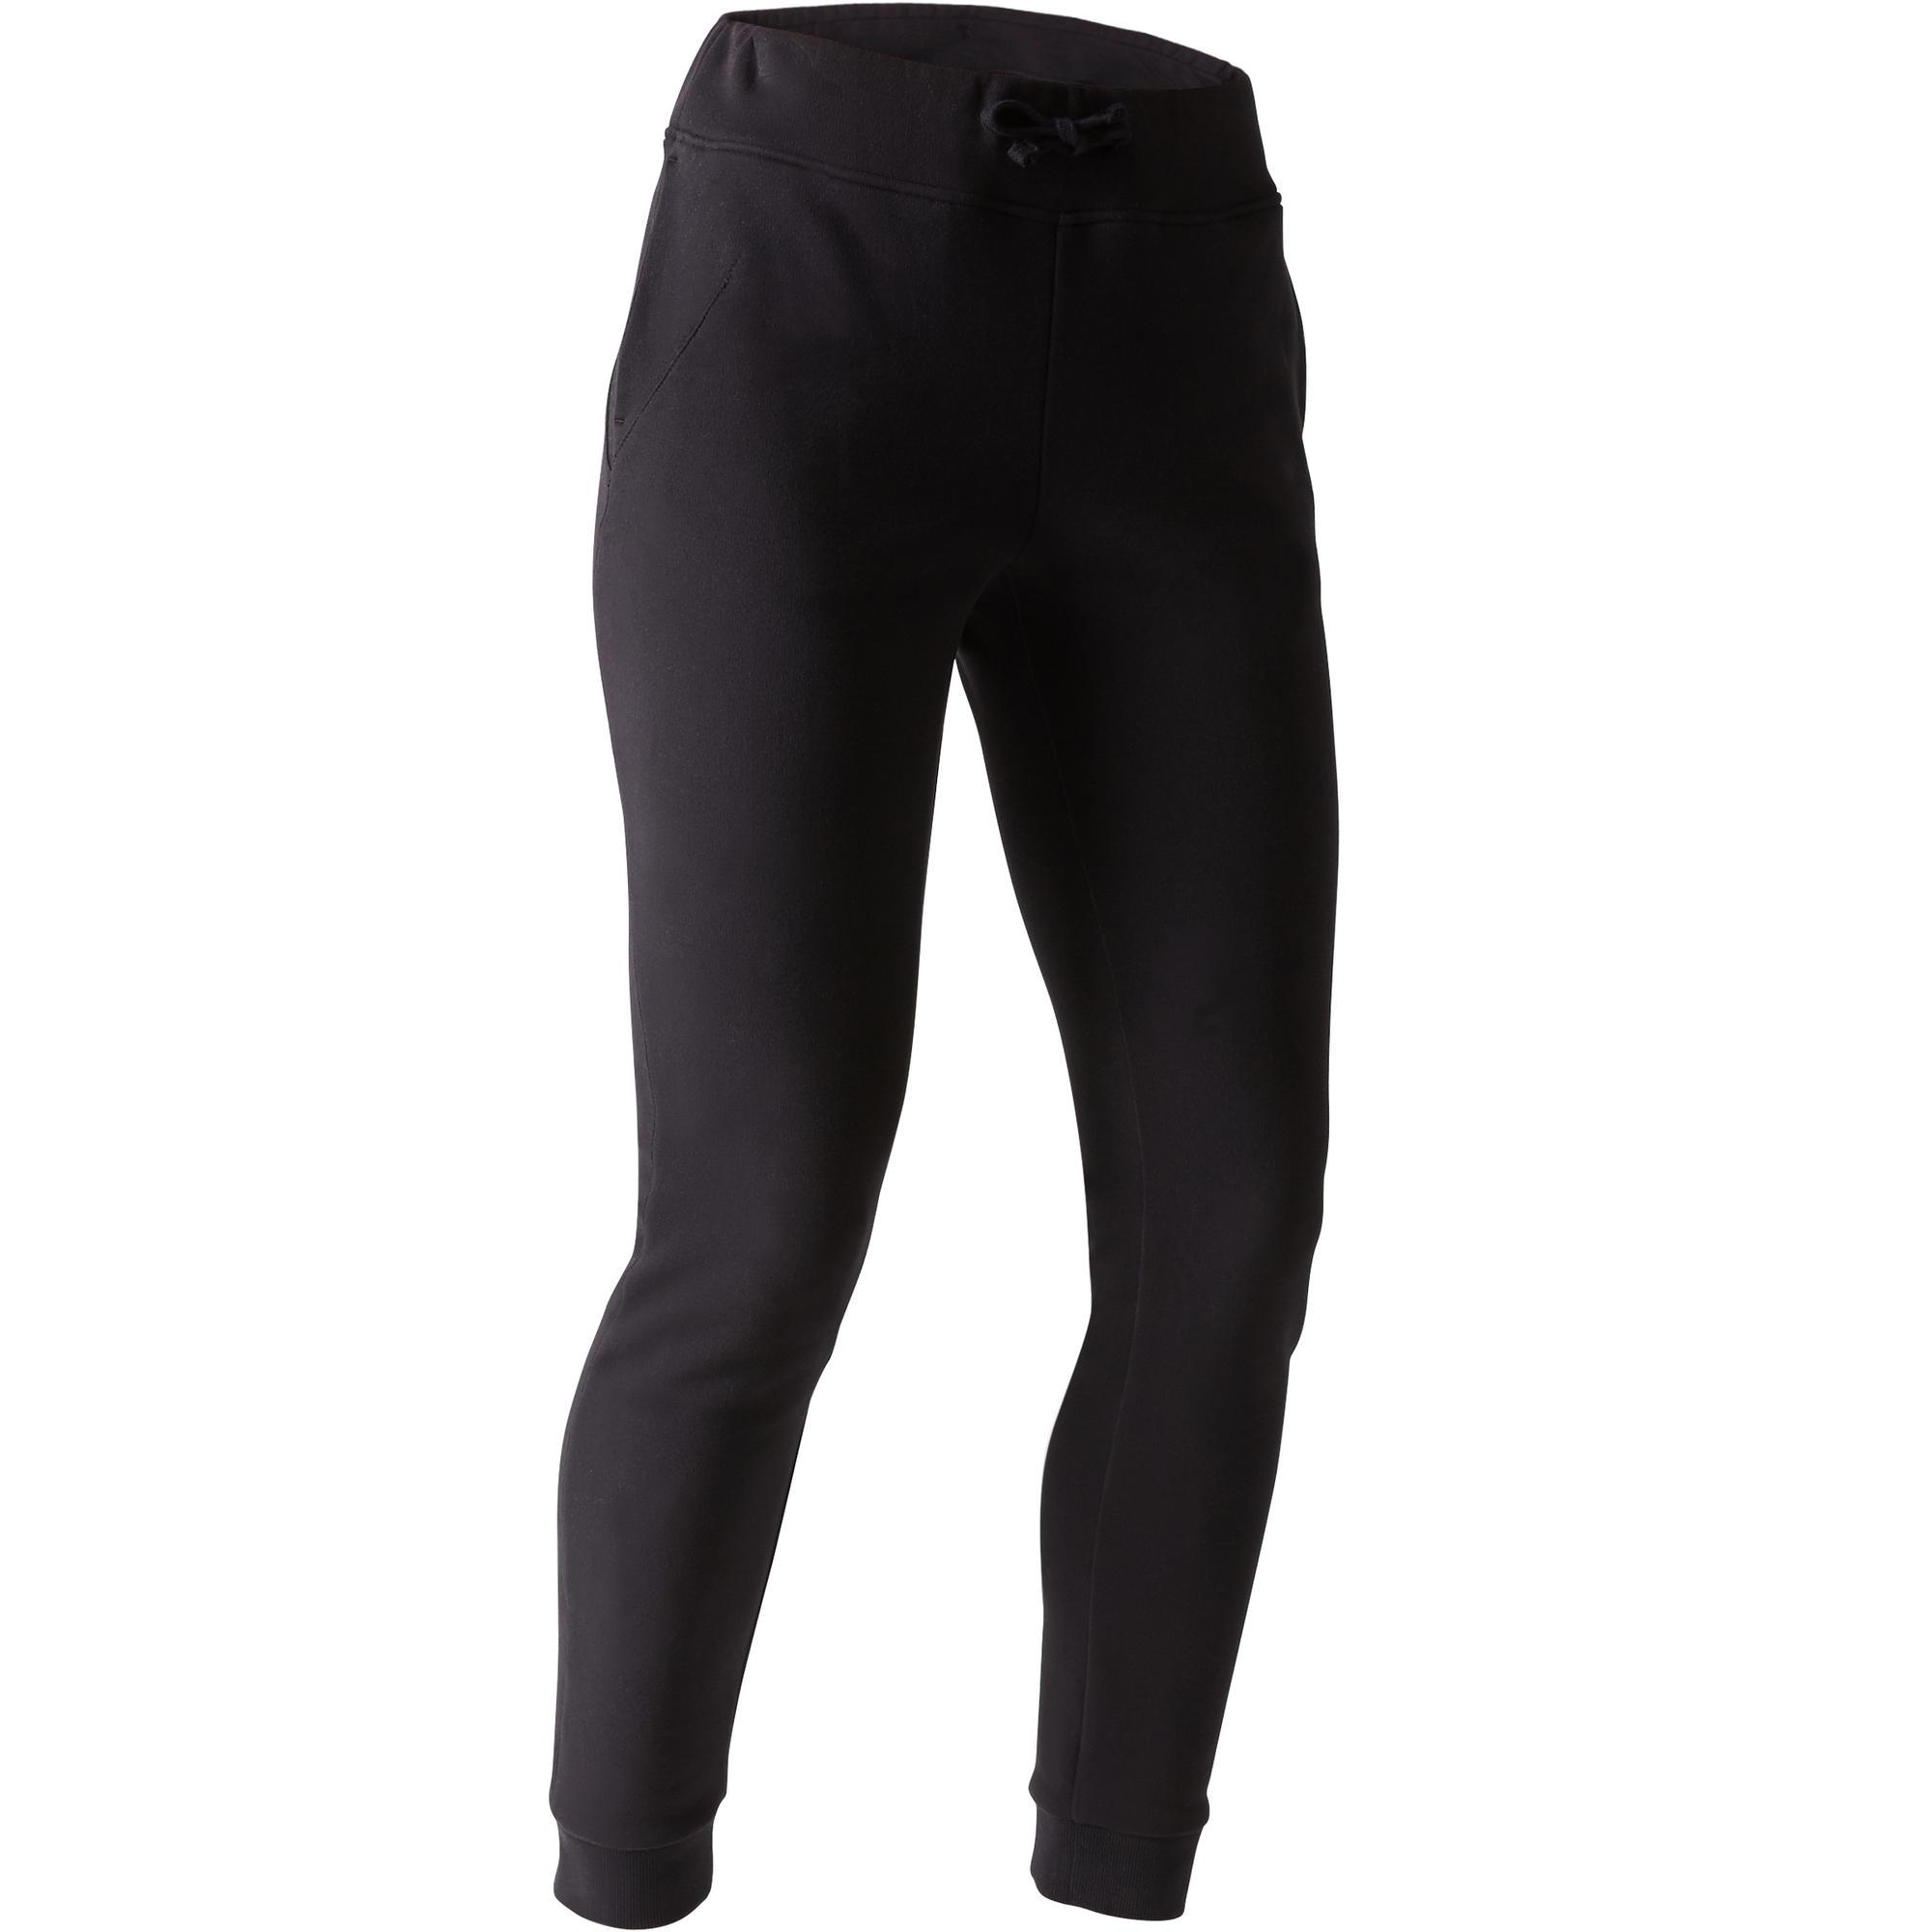 Vêtements Noir Femme Stretching 520 Gym Slim Pantalon odshQBtrCx